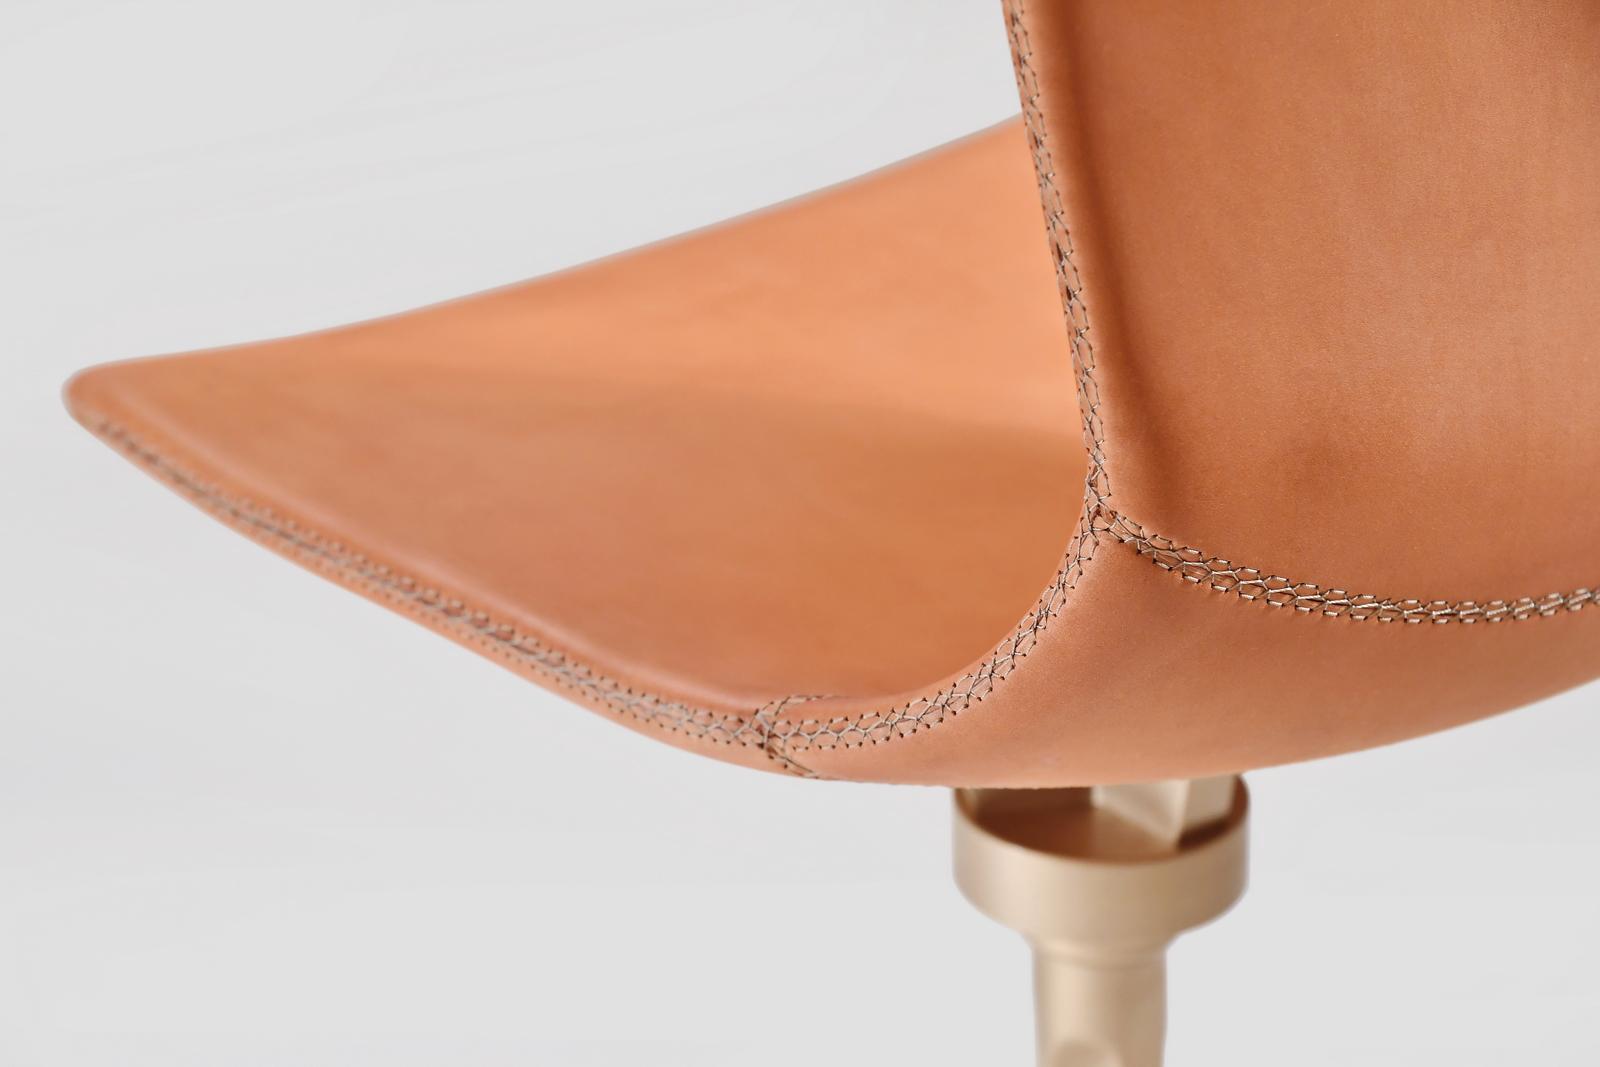 PTendercool-Chair-PT47-BS1-MB-200701-09